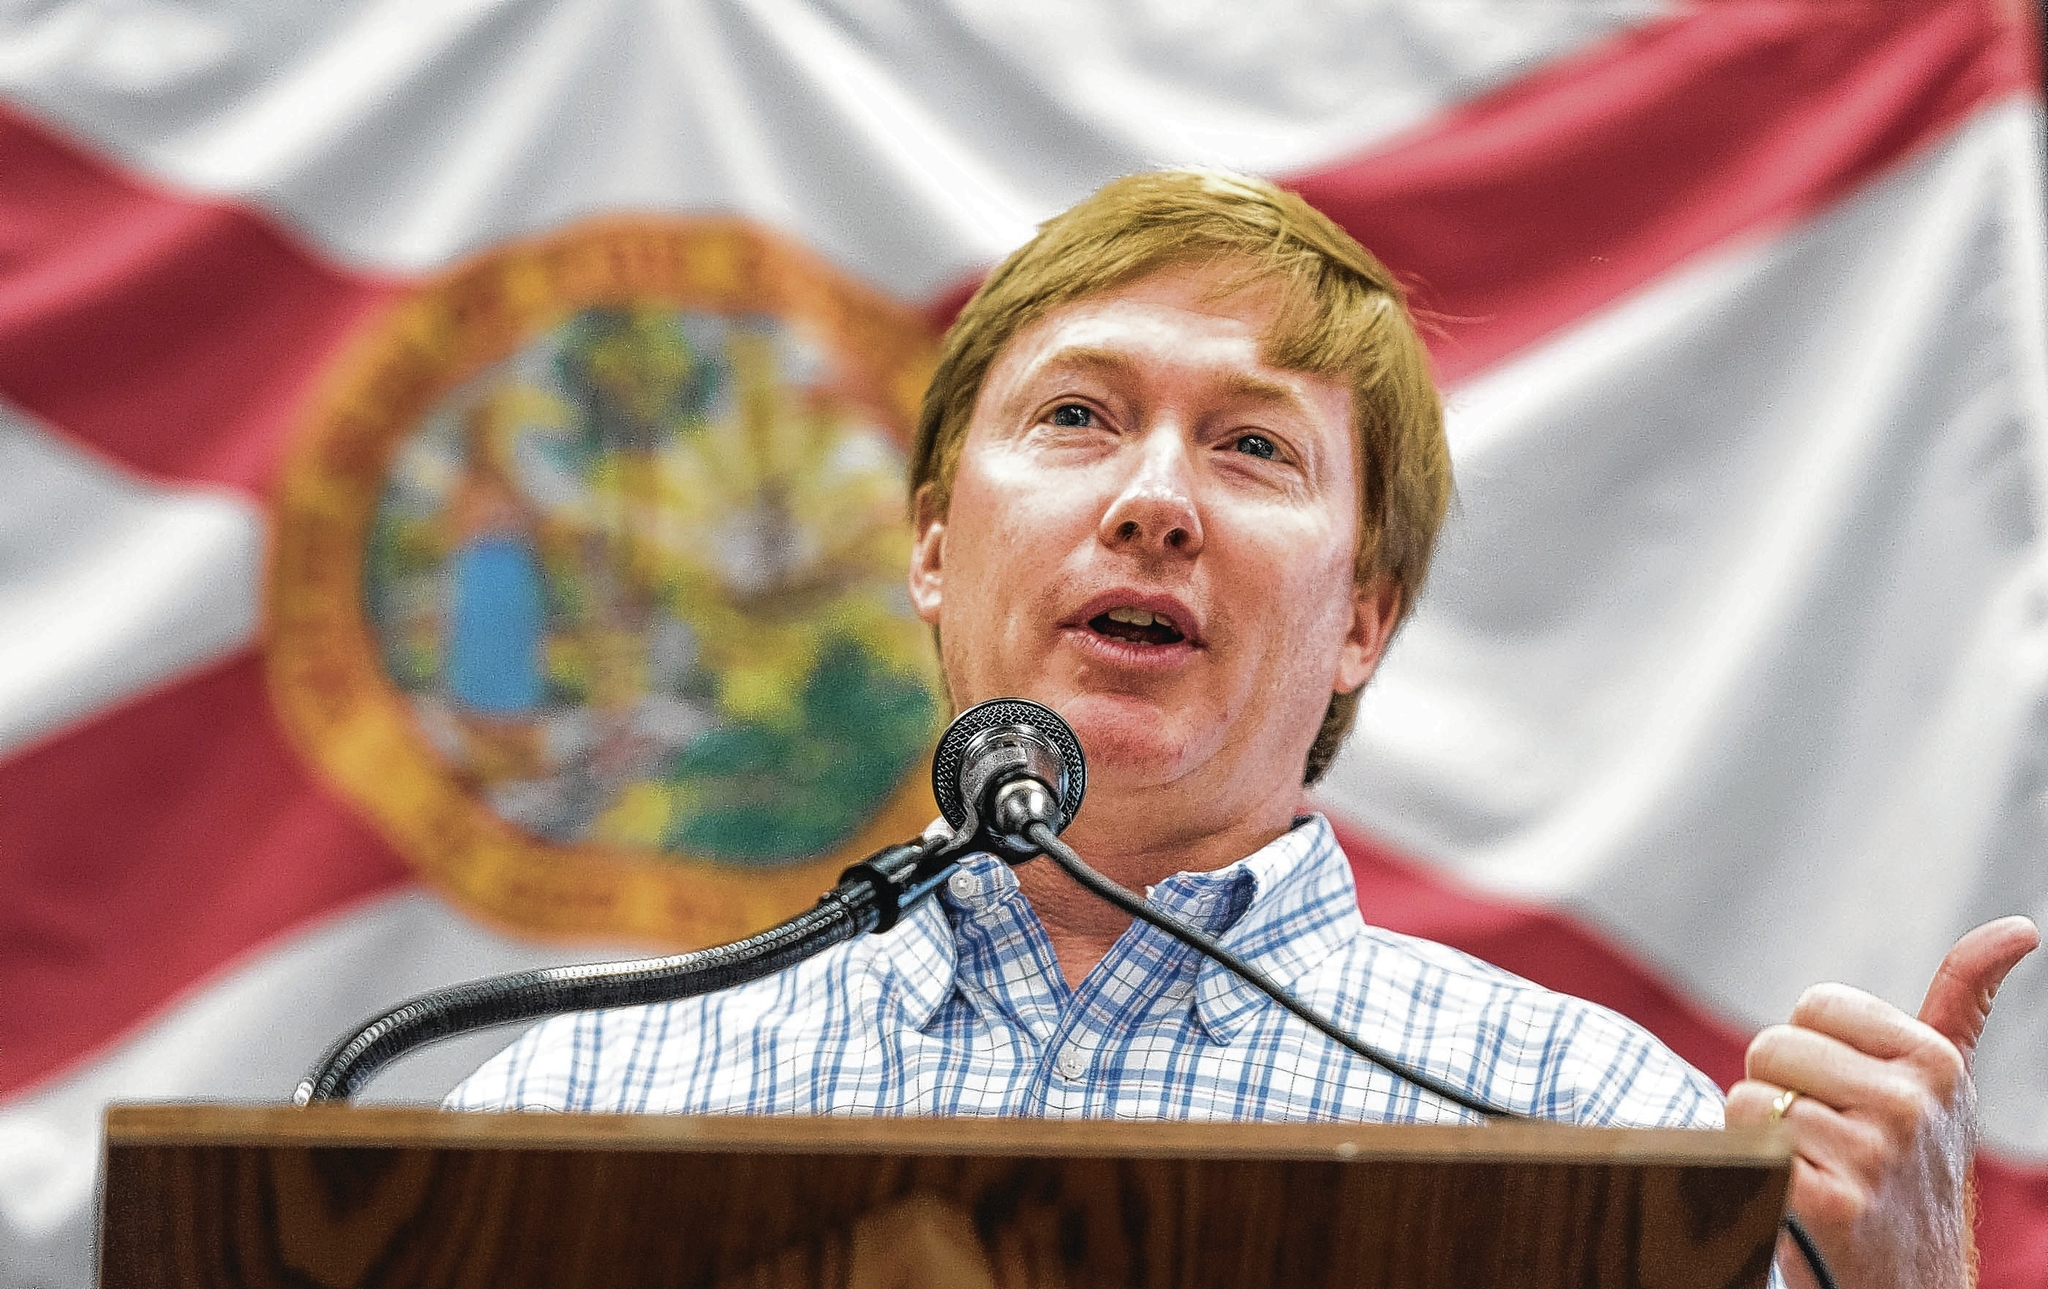 Putnam Officially Launches 2018 Gubernatorial Bid